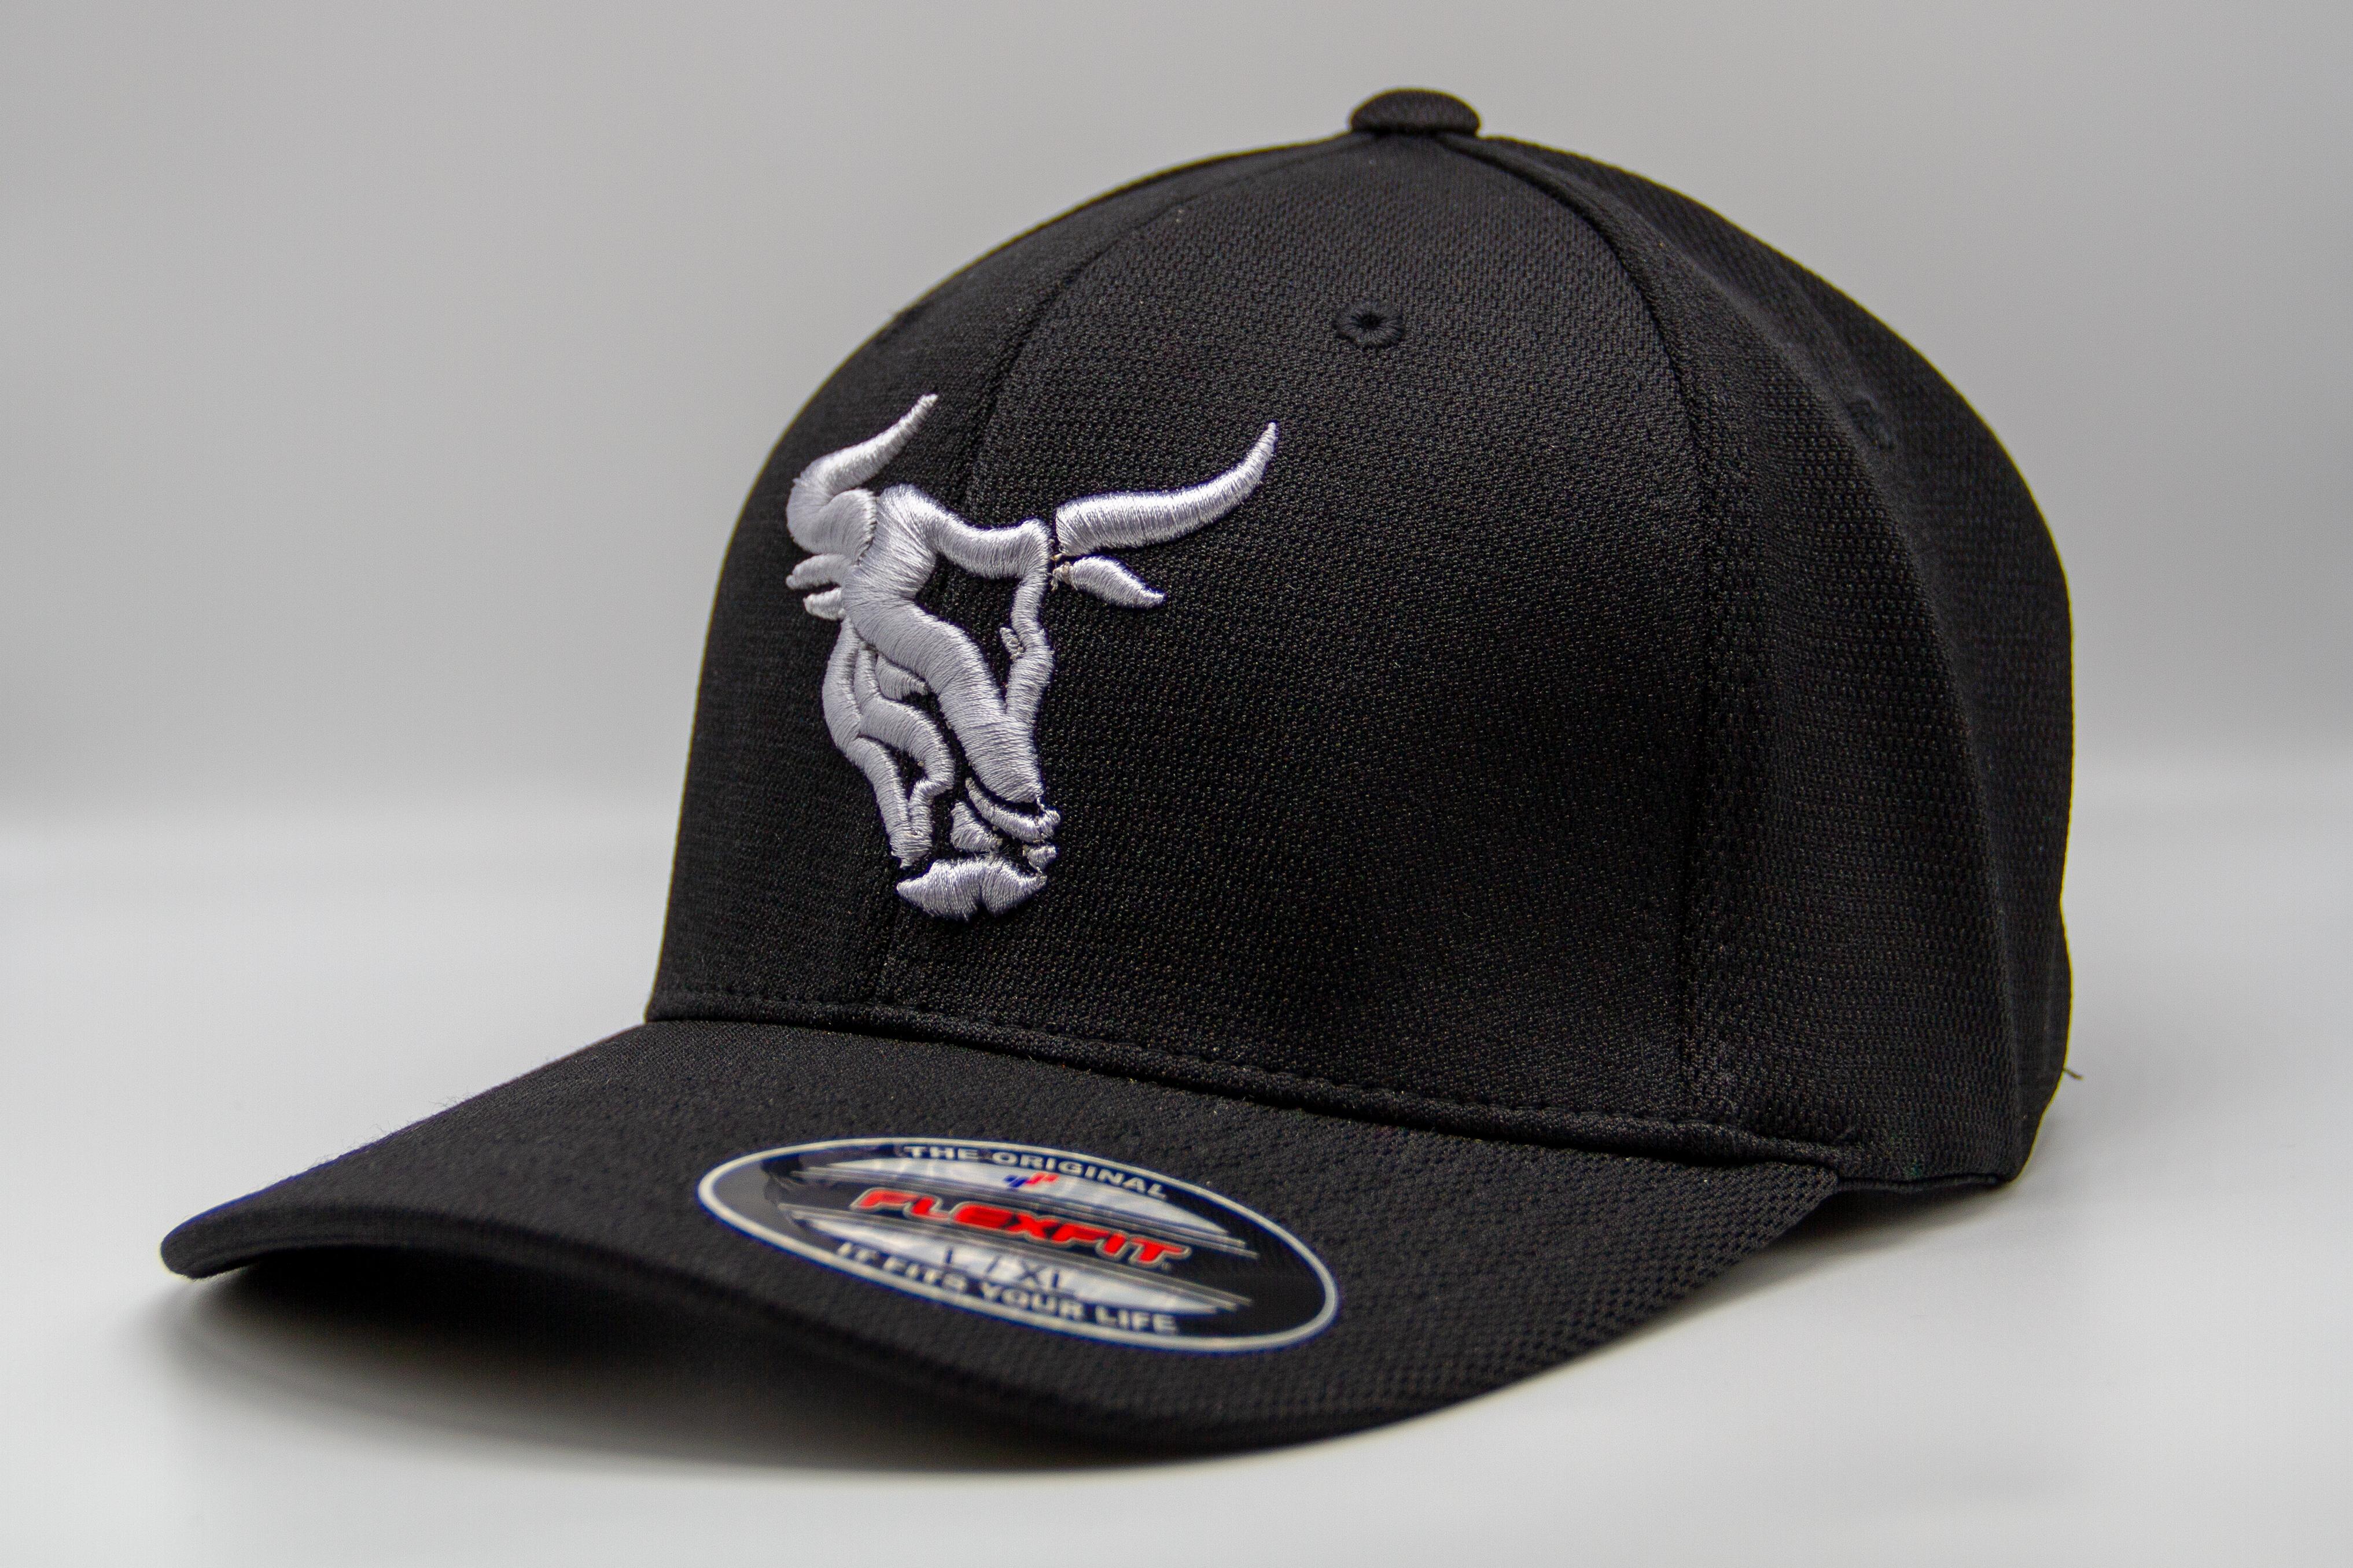 Beefcake Sport Tek Flexfit Cool Dry Shop for mens hats & caps in mens hats, gloves & scarves. deweze gear 3dcart